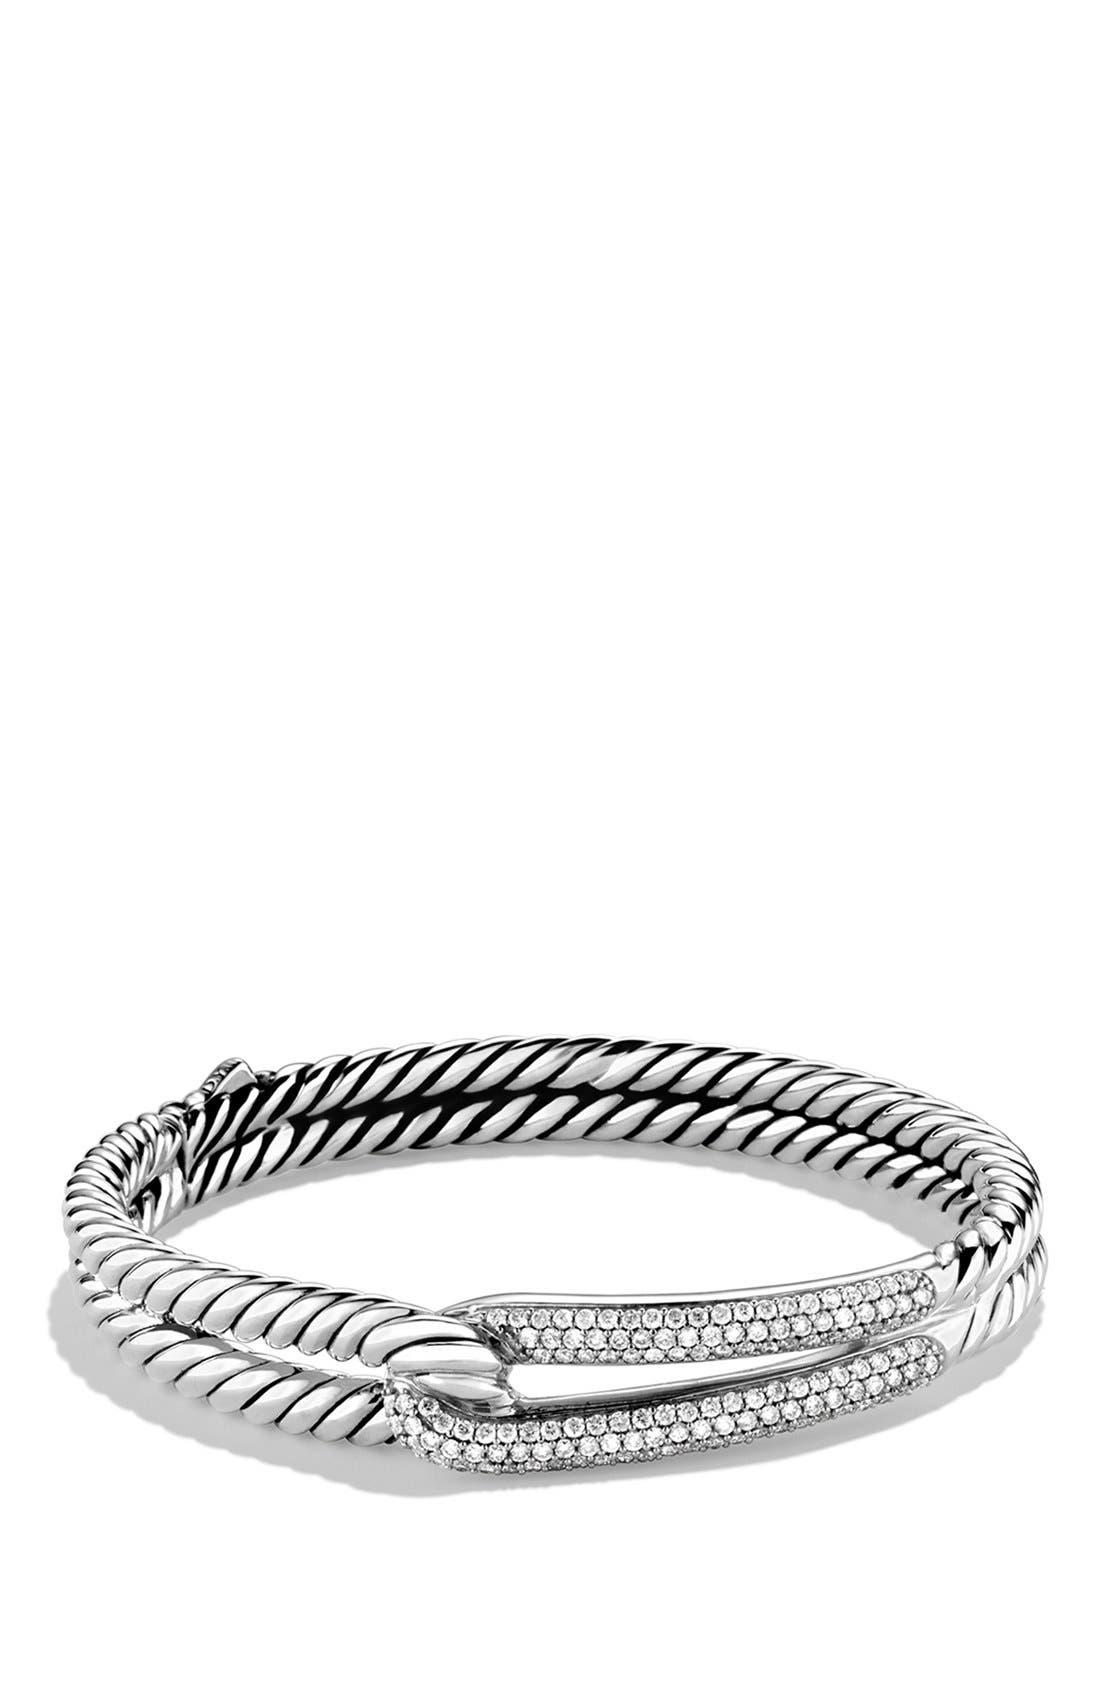 Main Image - David Yurman 'Labyrinth' Single-Loop Bracelet with Diamonds